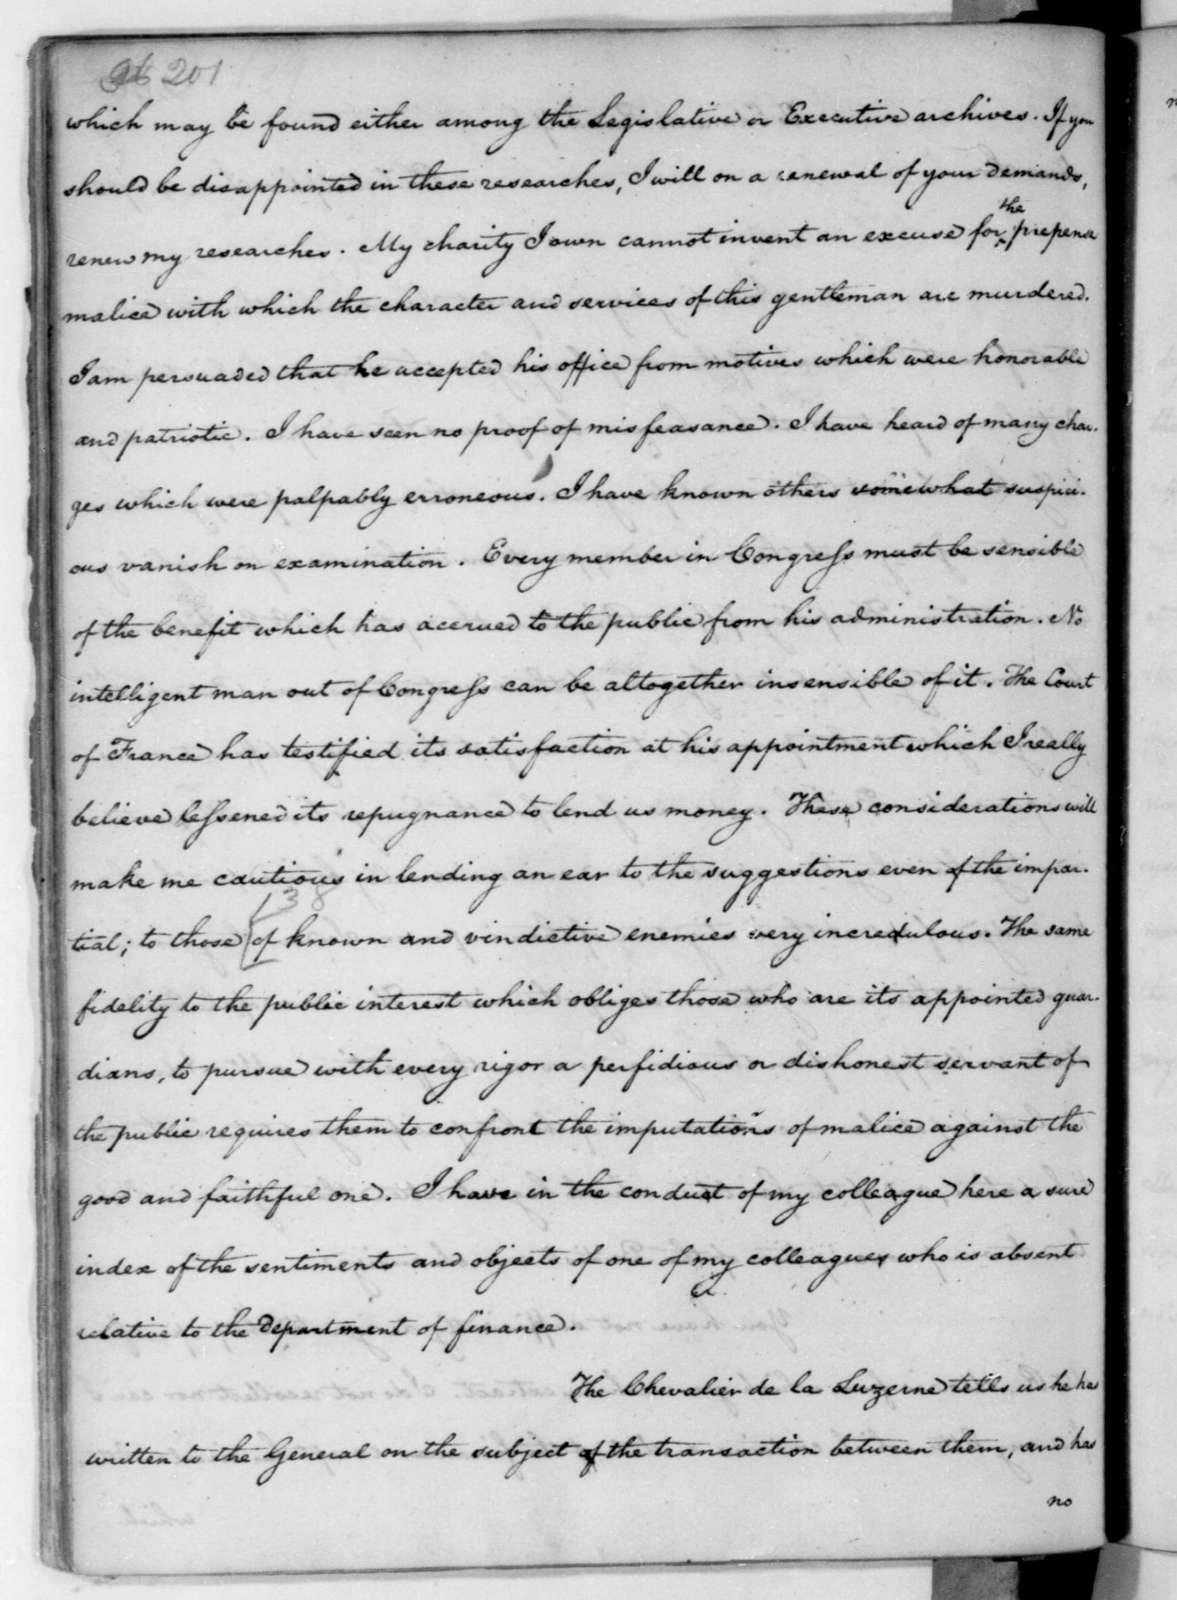 James Madison to Edmund Randolph, June 4, 1782.